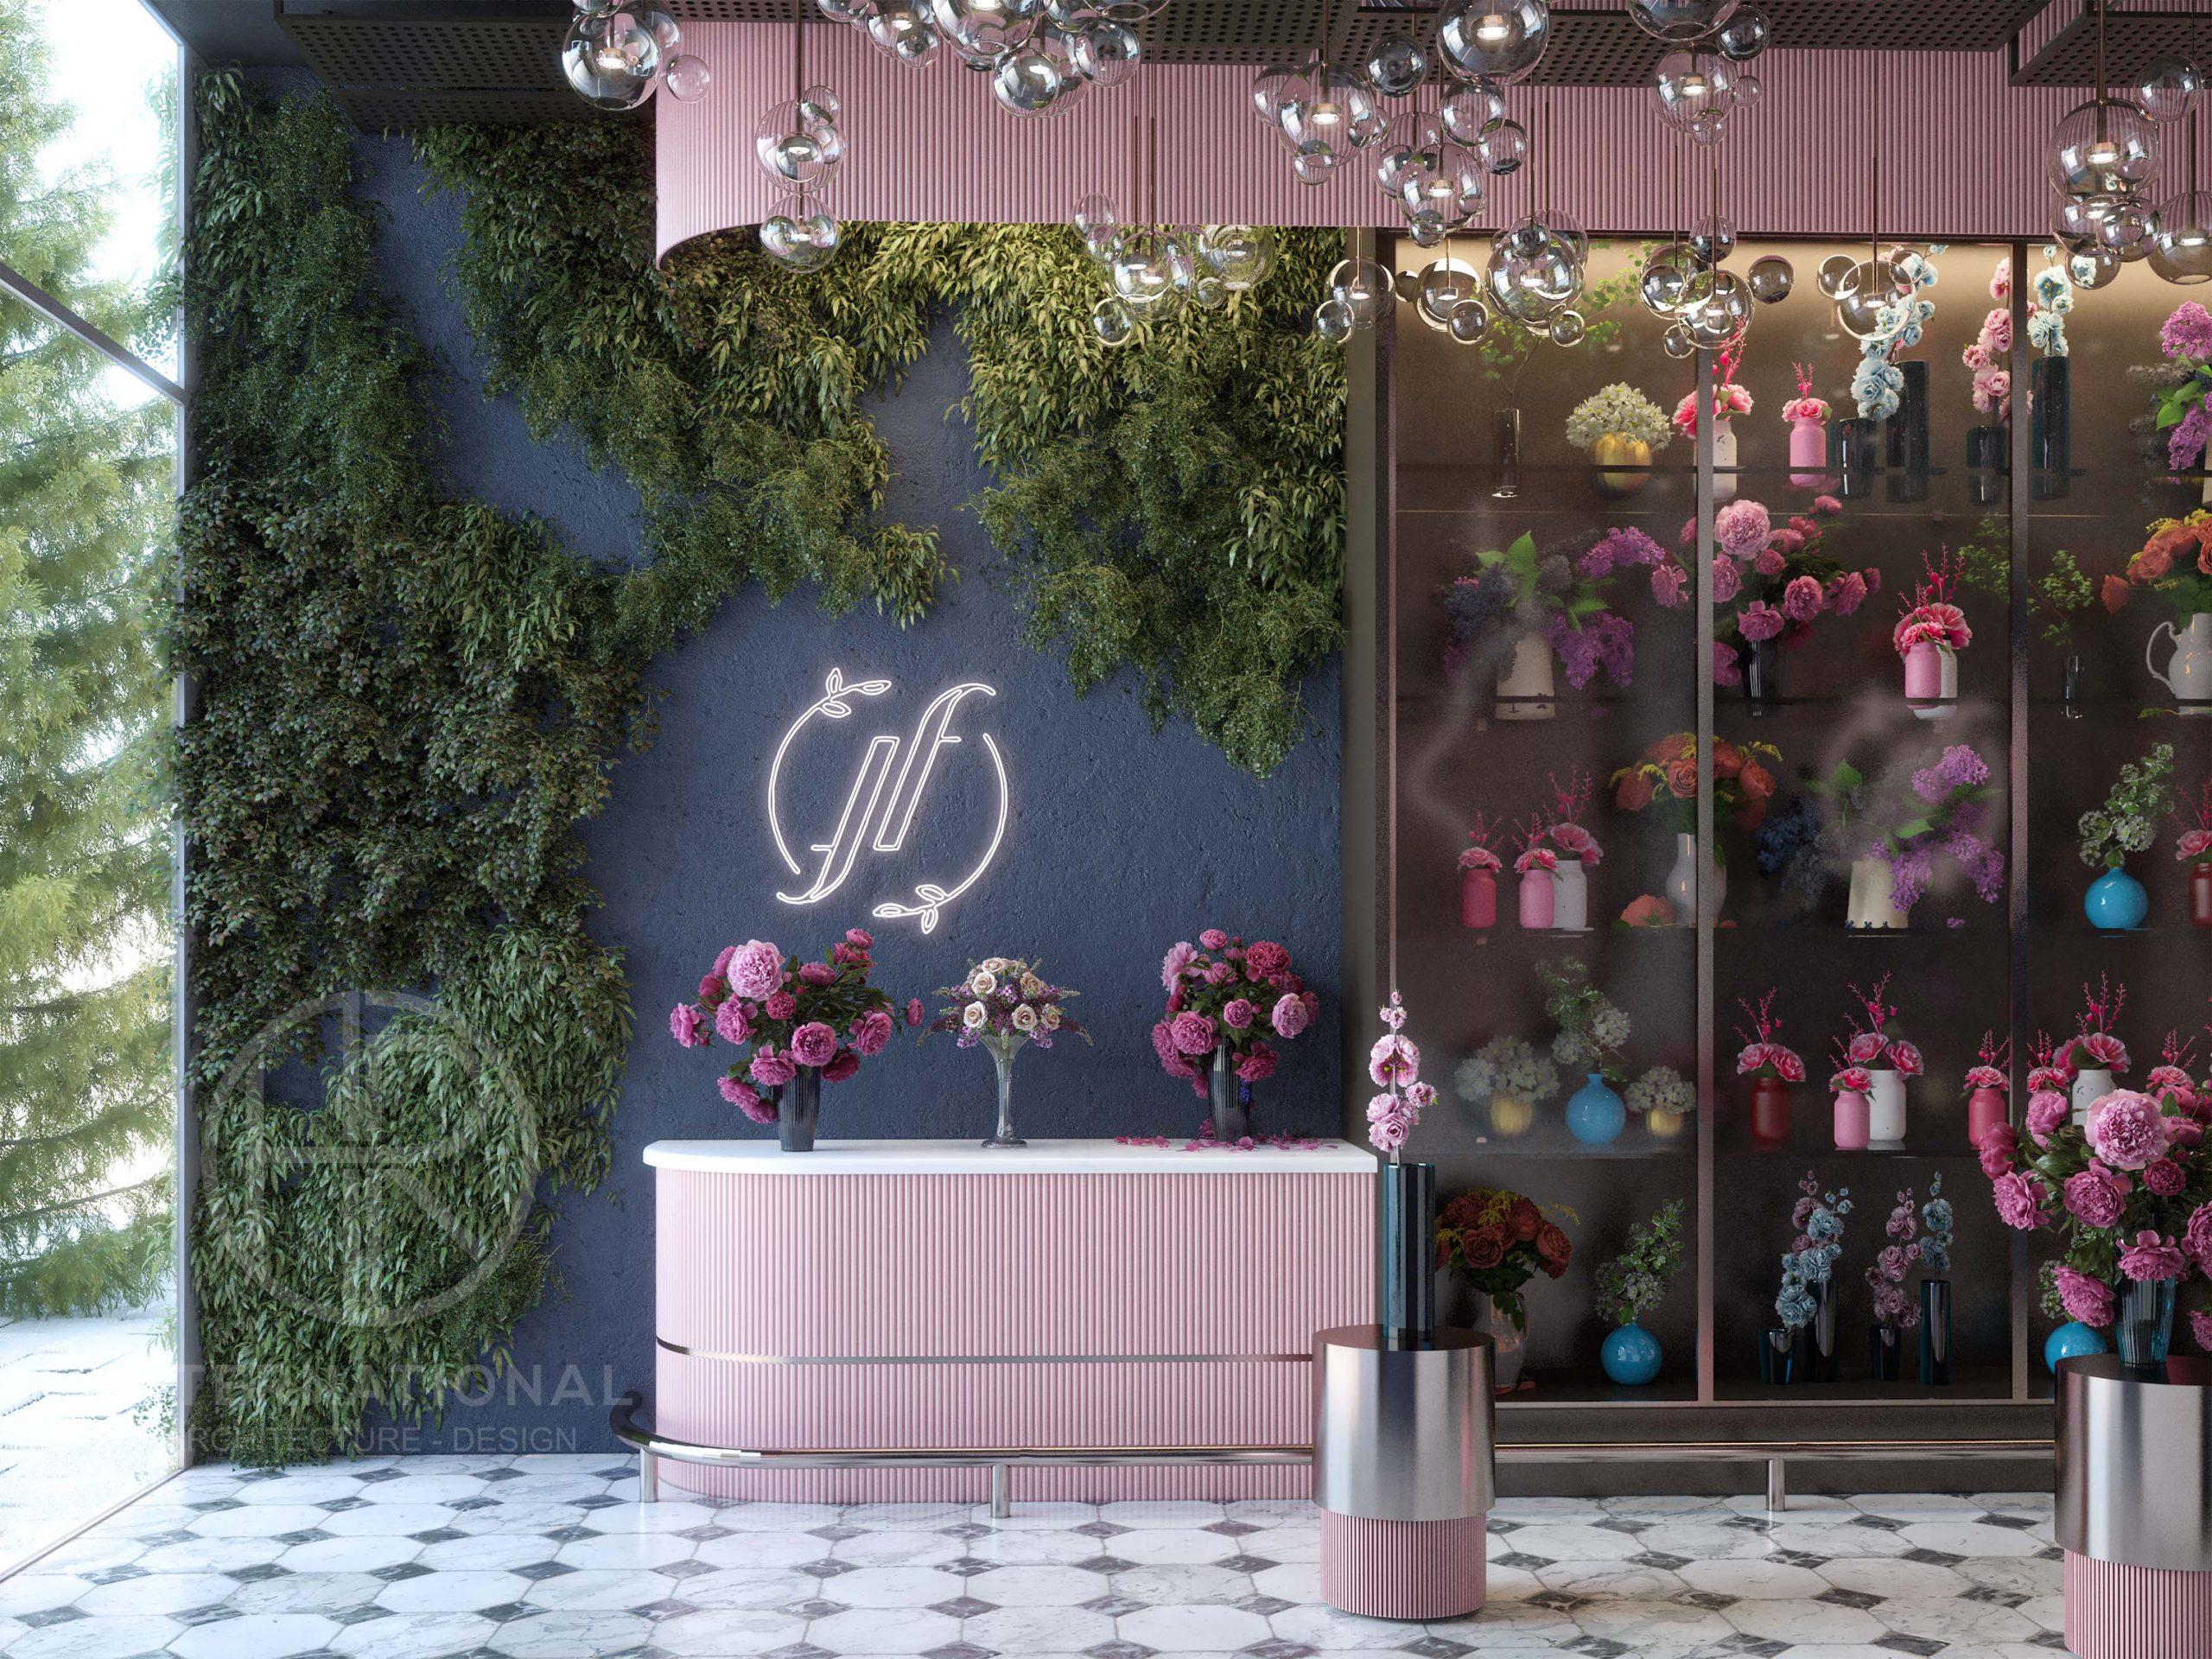 FLOUR & FLORET DESIGN - cake - design - flowers - blue - pink